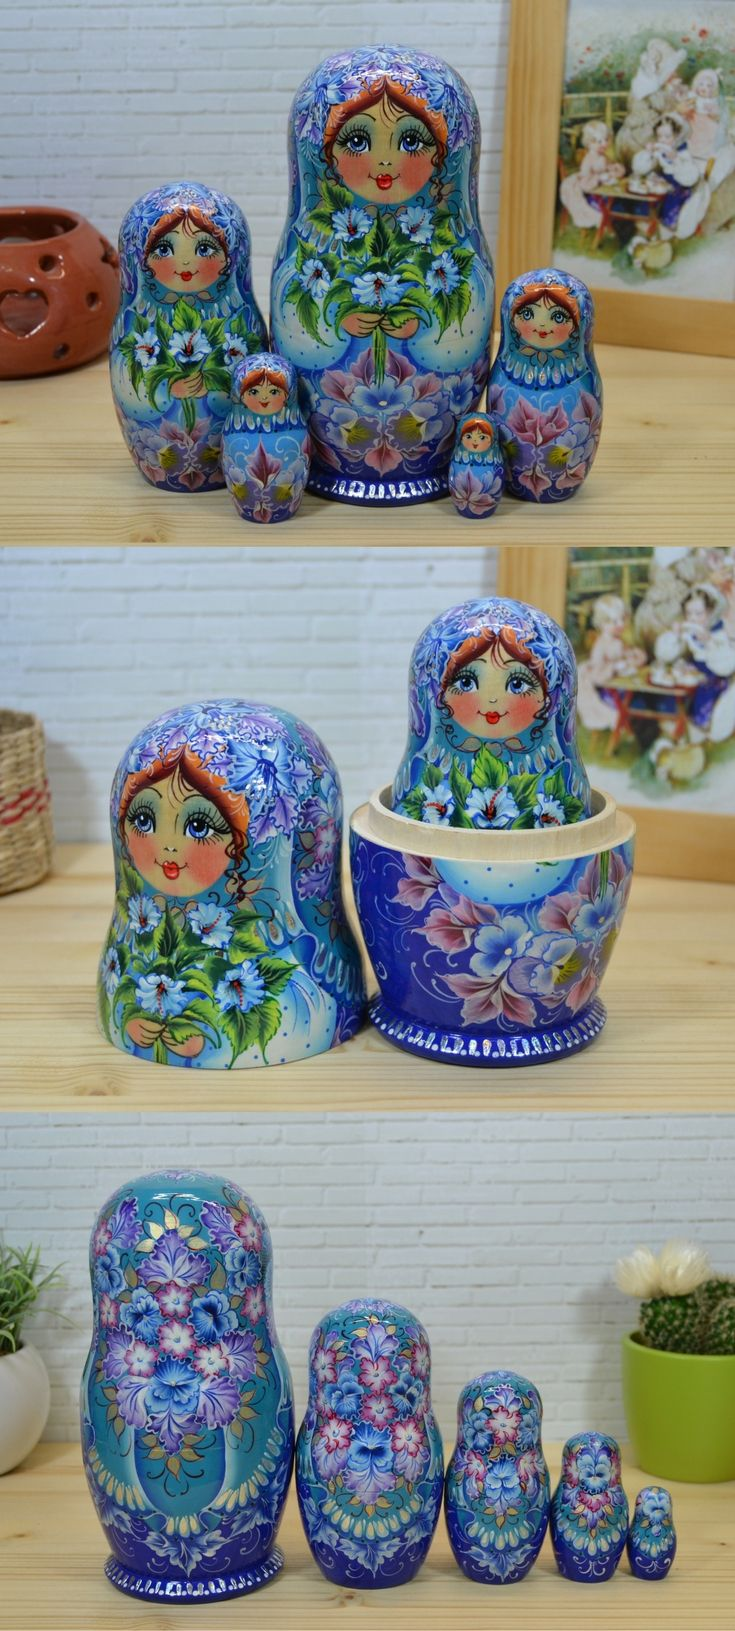 Russian nesting dolls in blue attire